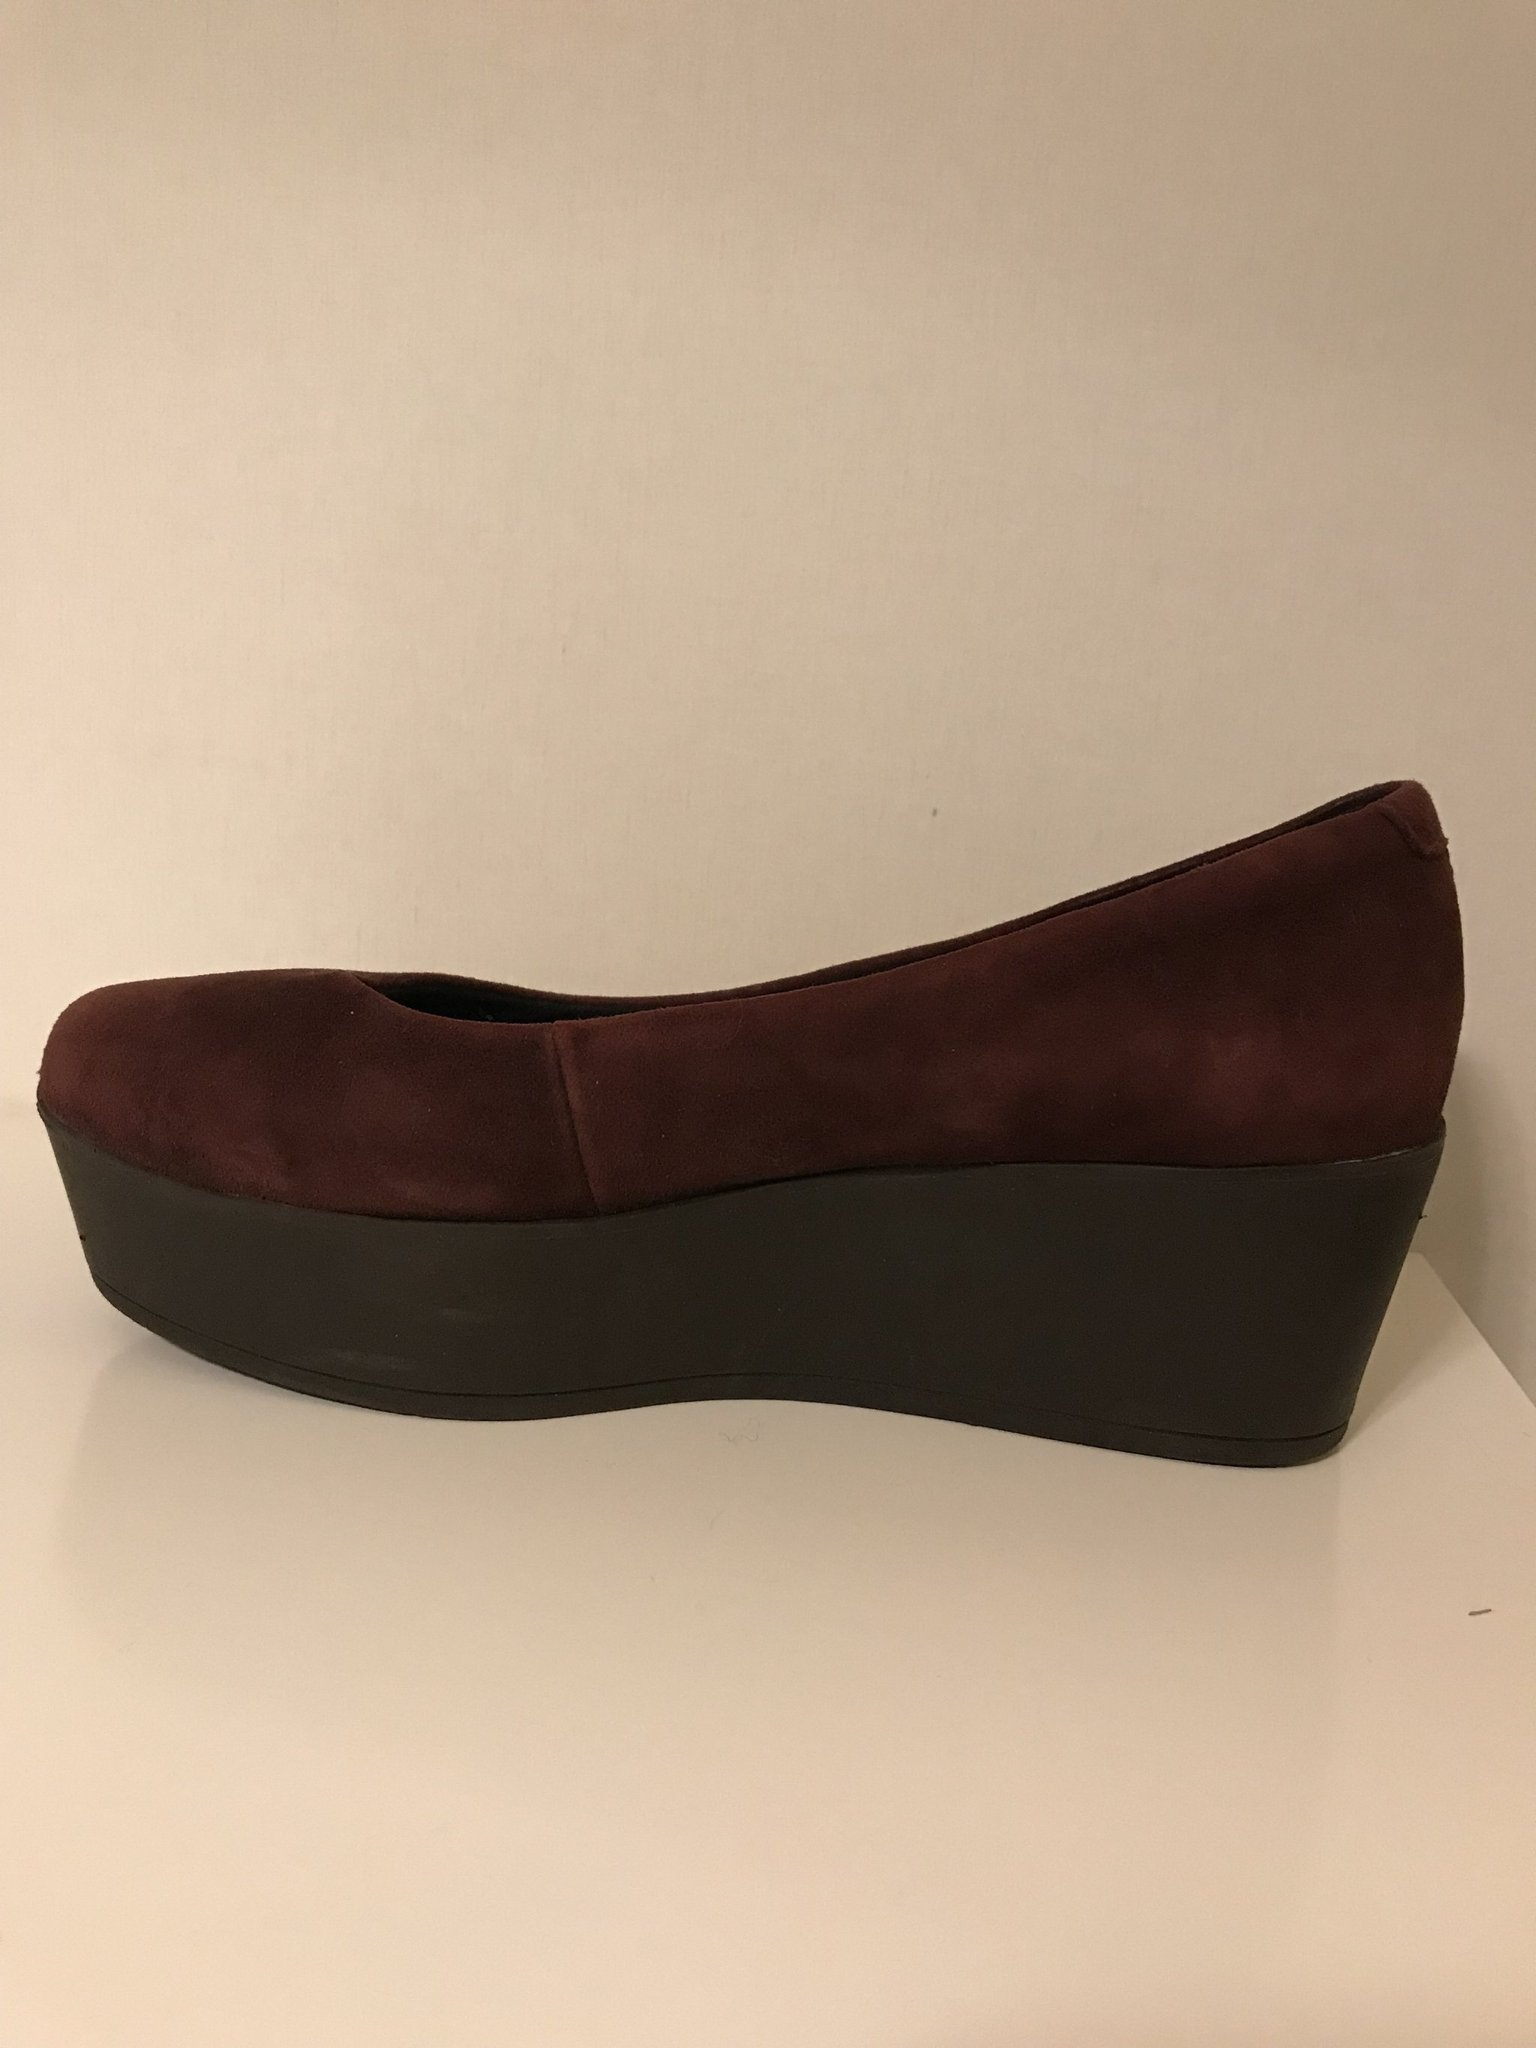 skor med svart sula